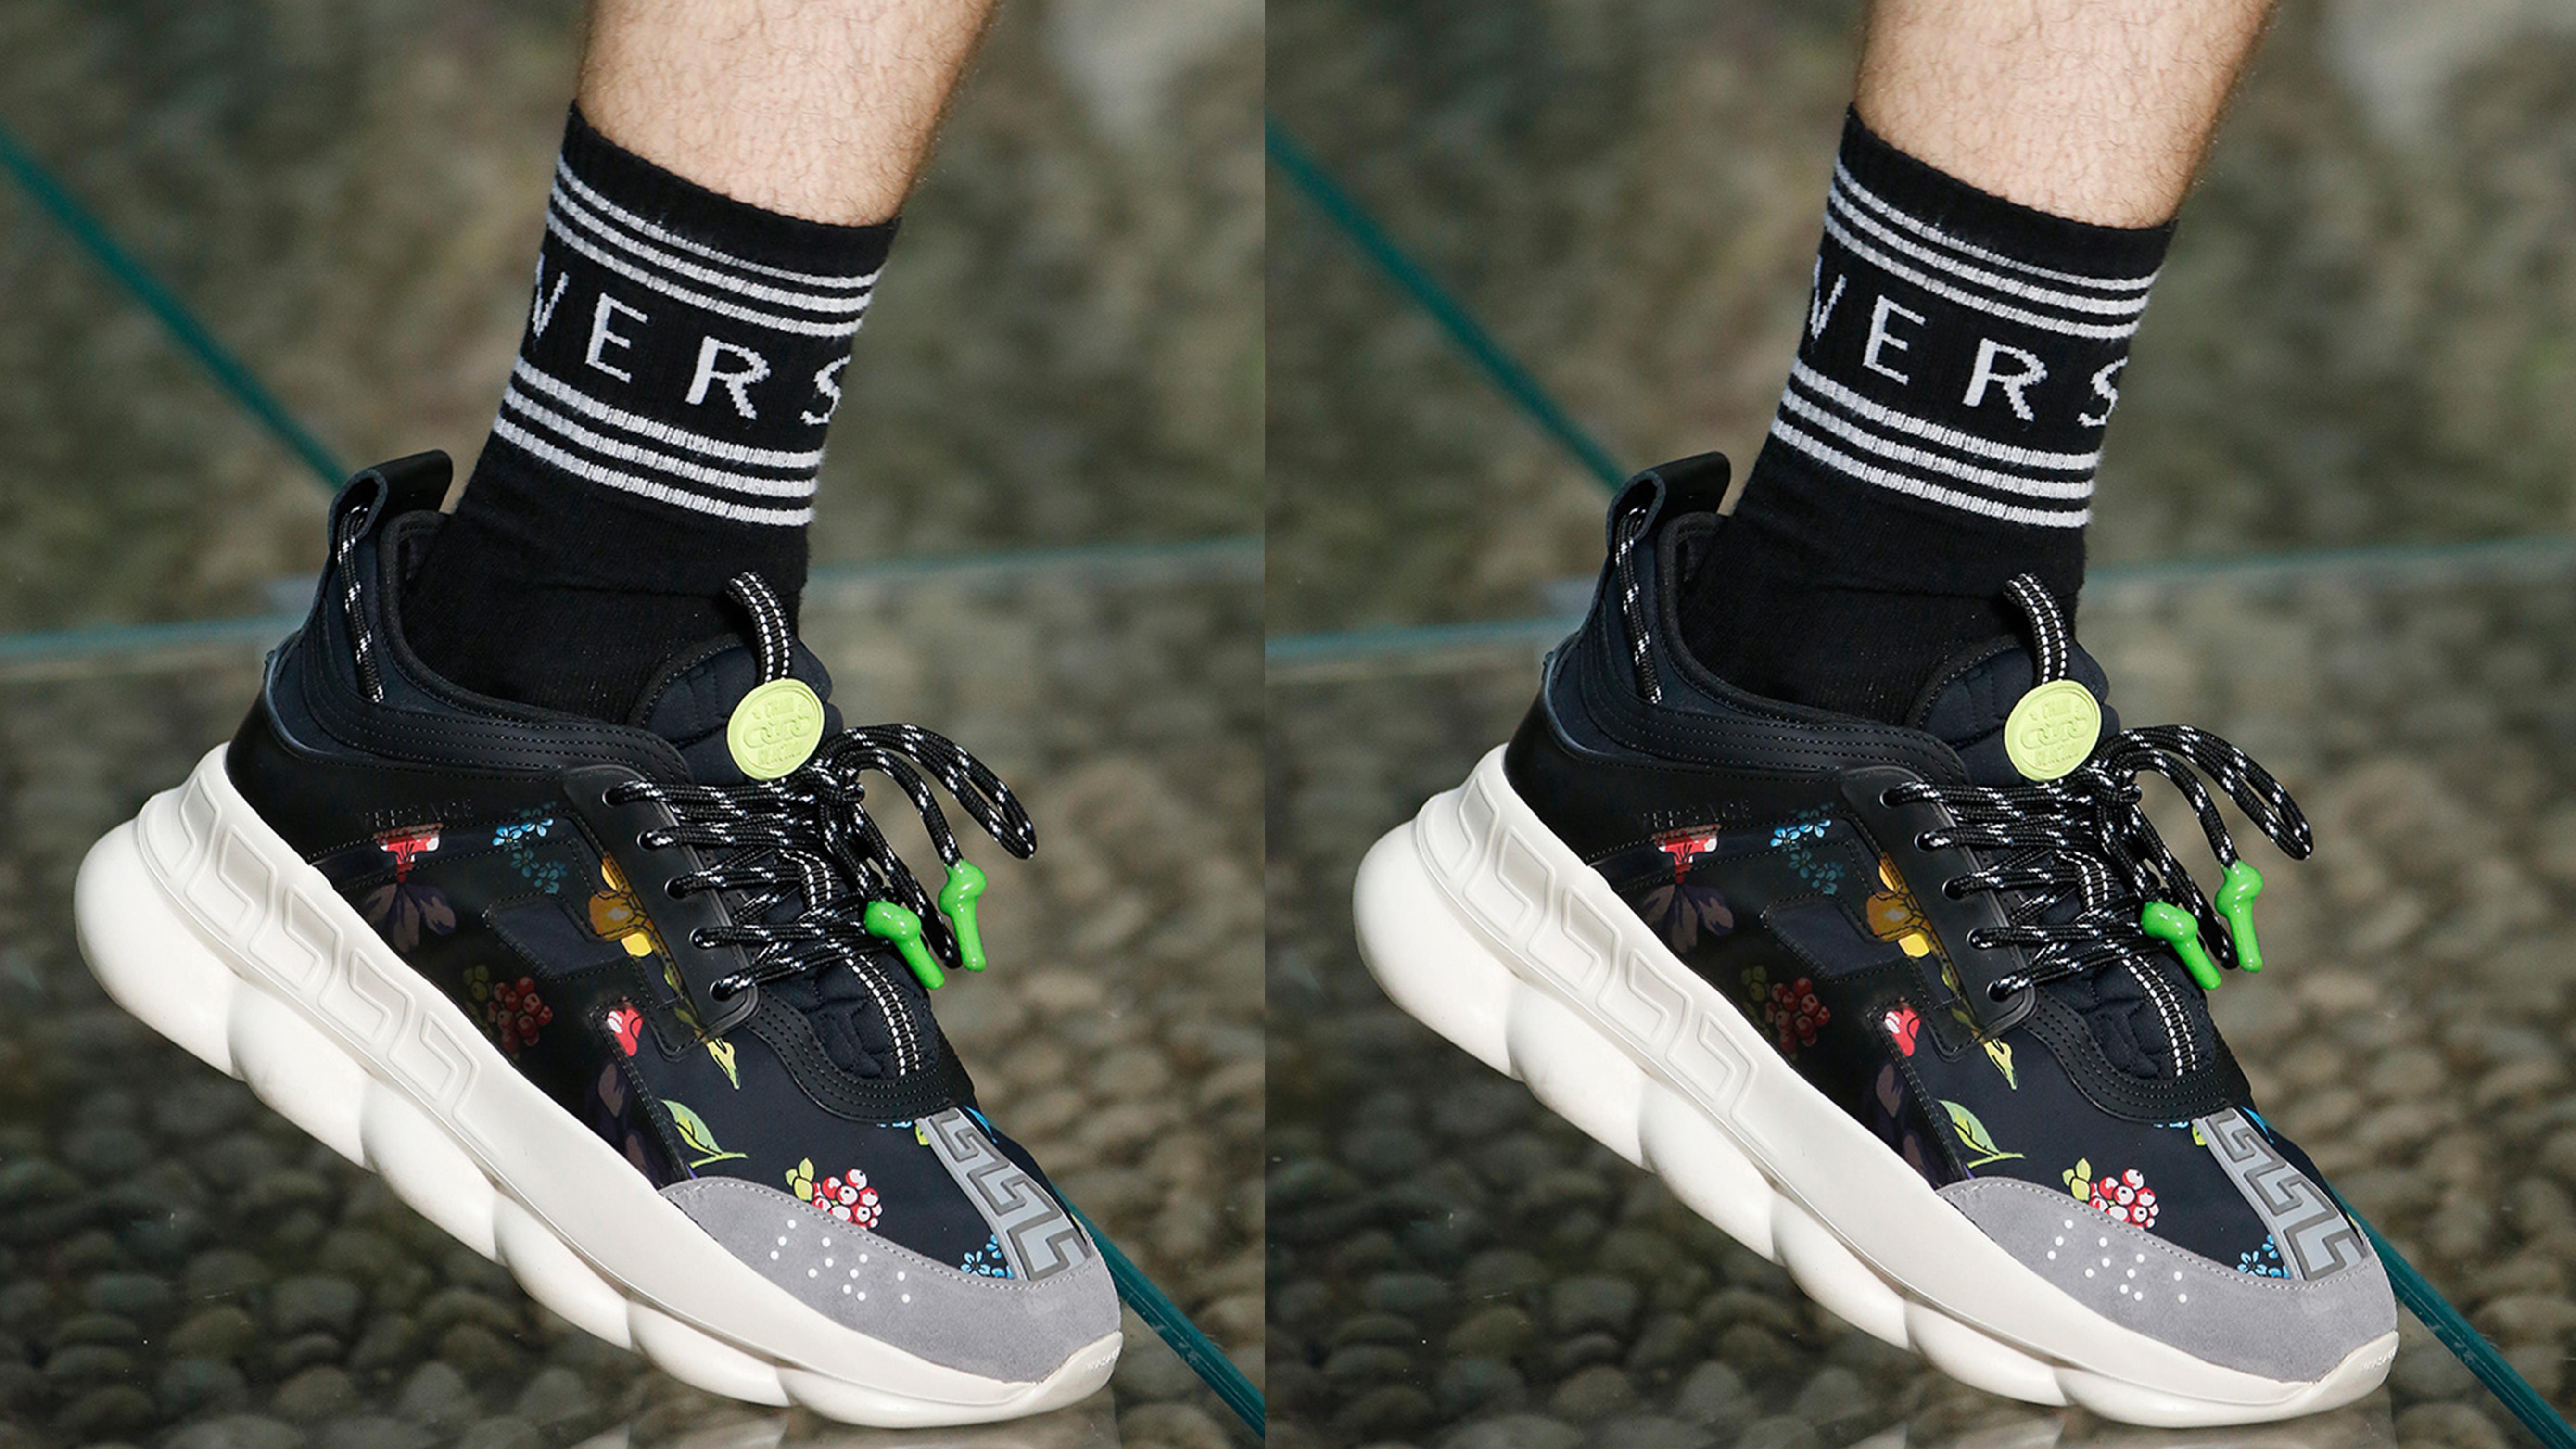 Die besten Sneaker 2018/2019: Versace